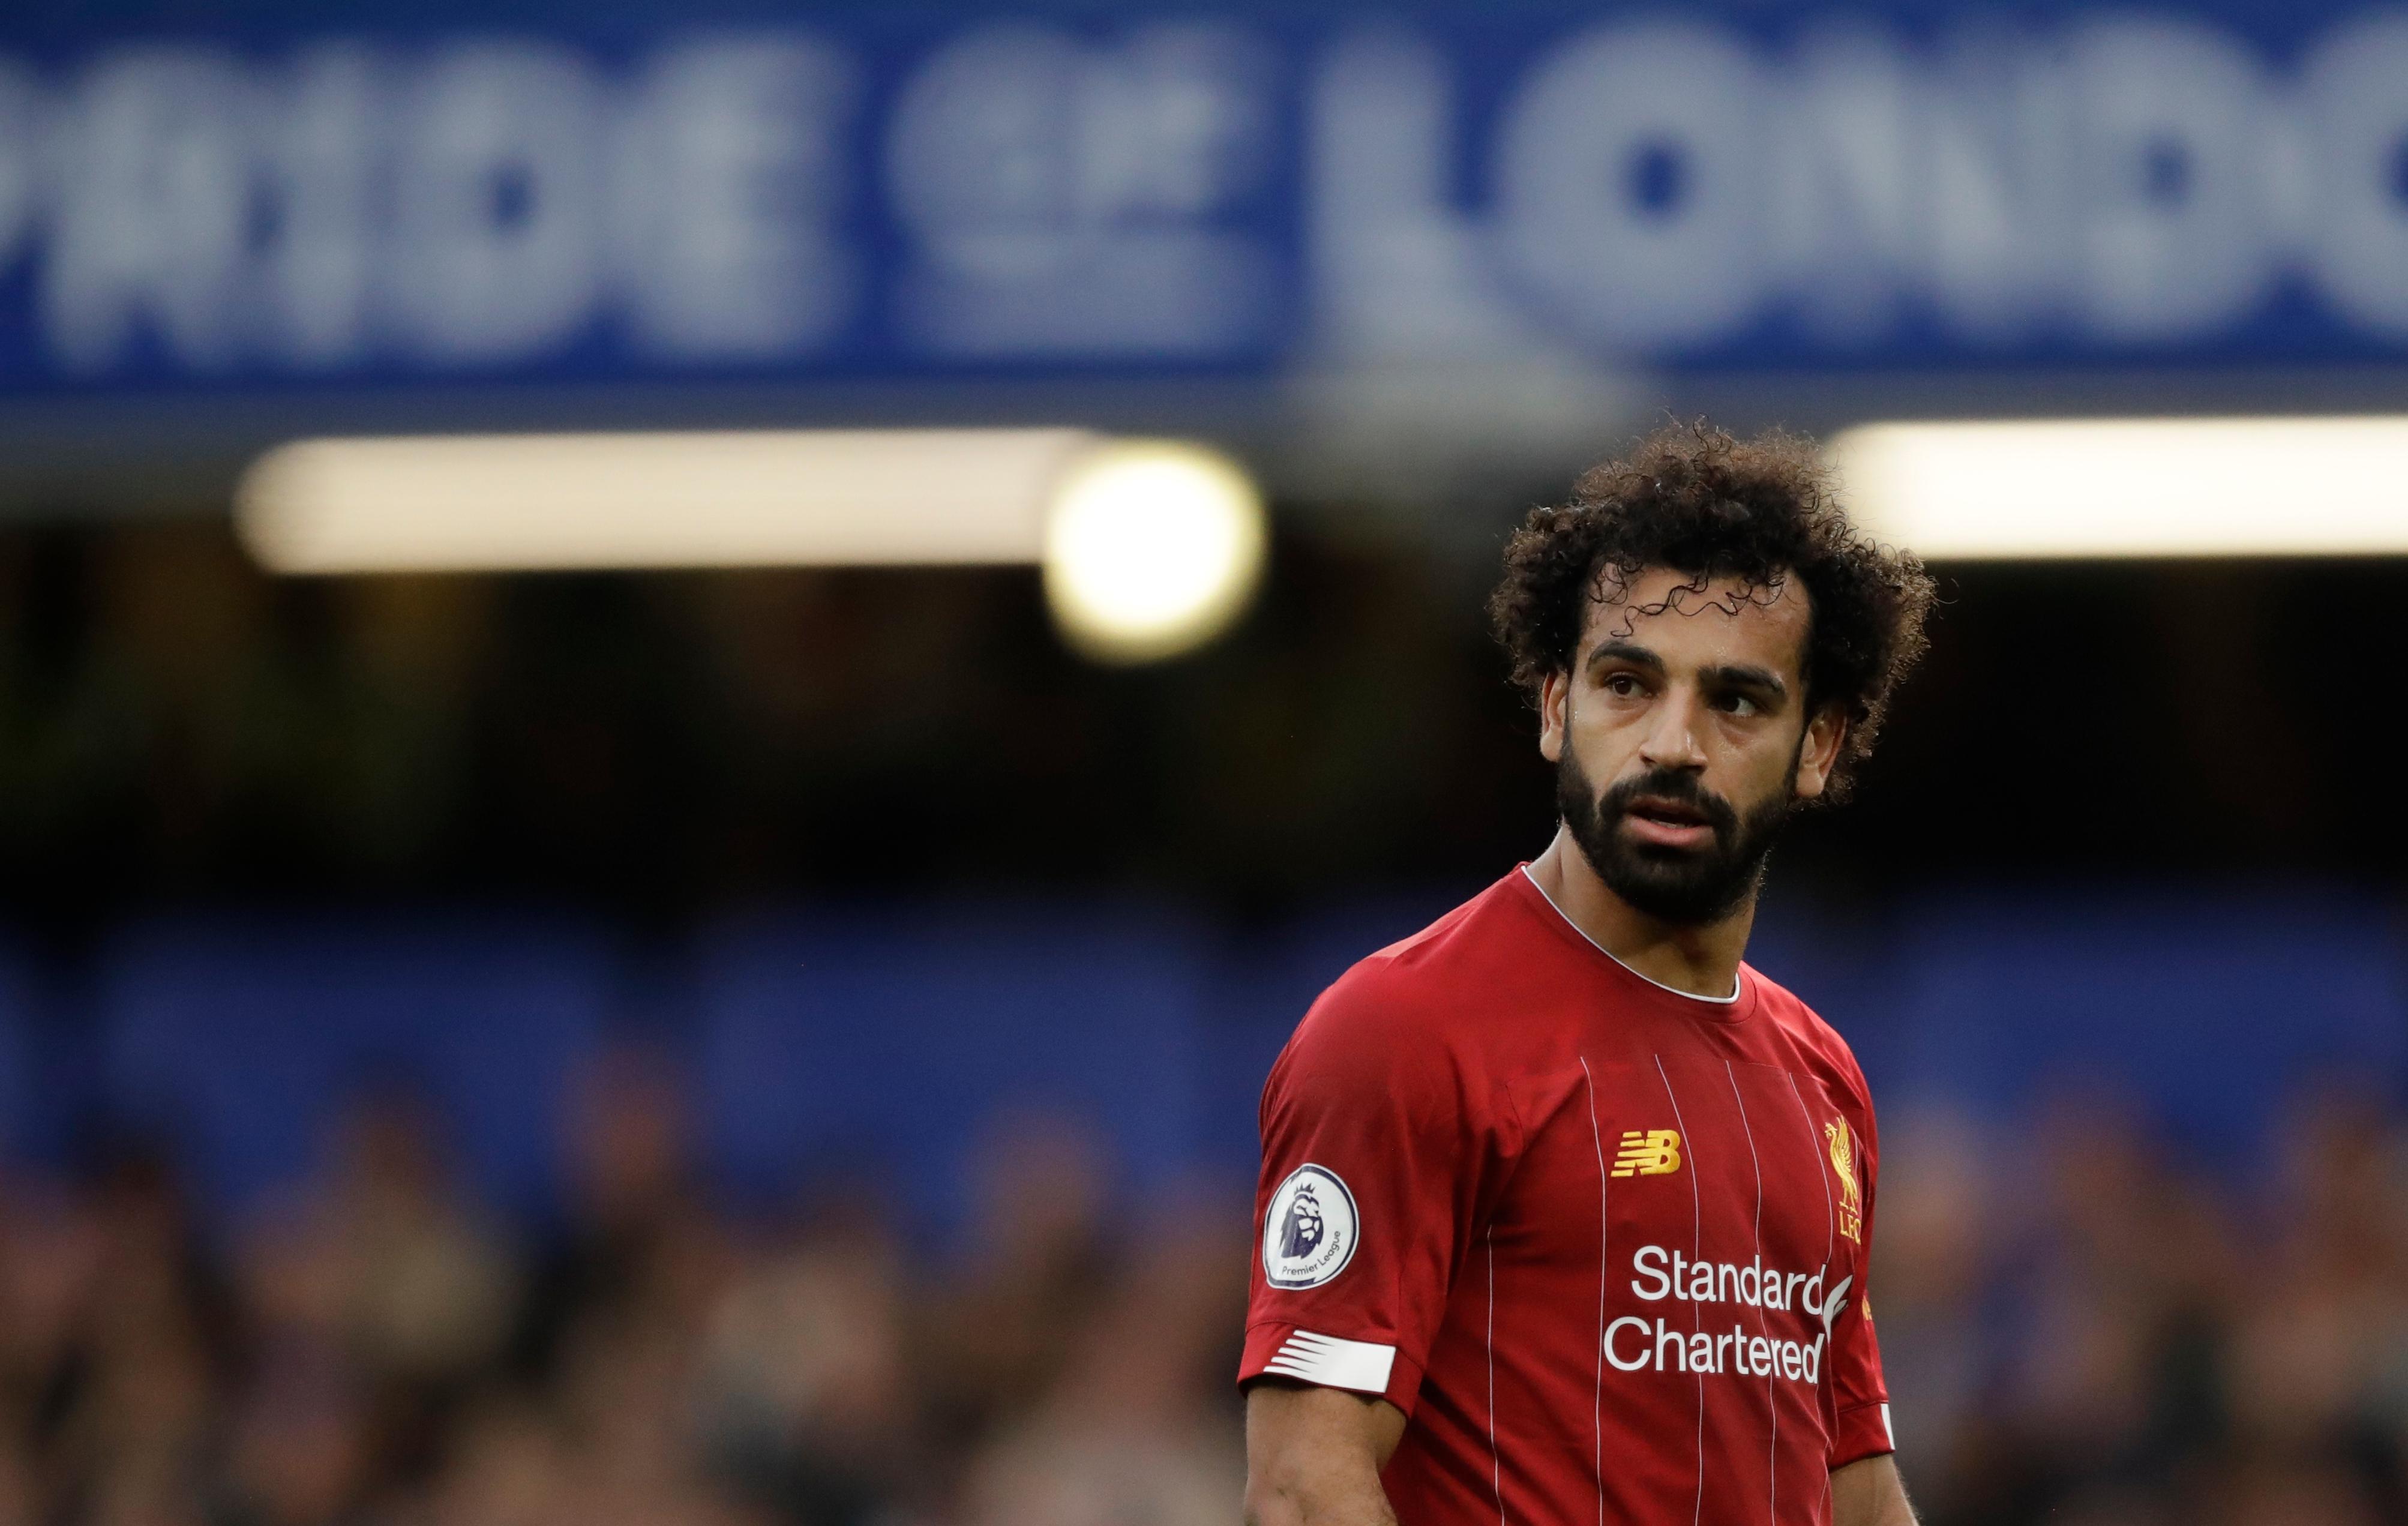 Liverpool Vs Napoli Free Live Stream 11 27 19 Watch Uefa